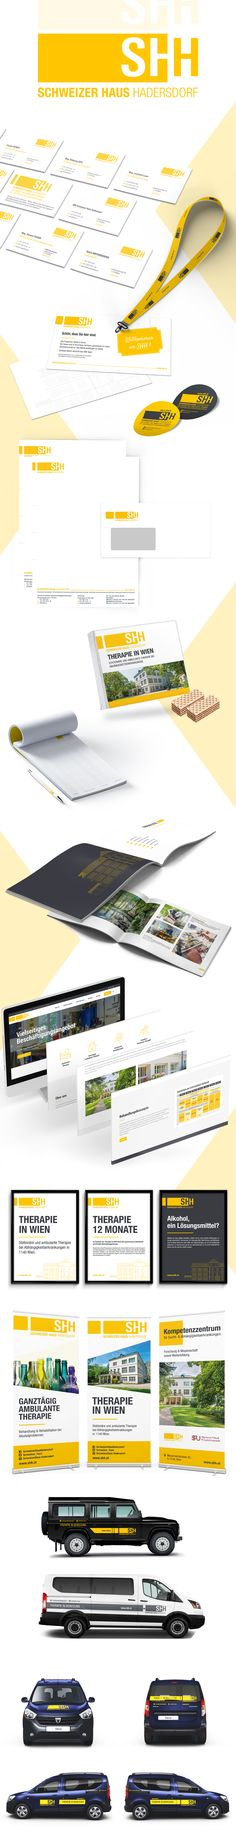 Schweizer Haus Hadersdorf - Corporate Design - designed by Designerpart - www.designerpart.com Web Design, Logo Design, Grafik Design, Corporate Design, Designer, It Works, Getting To Know, Swiss Guard, House